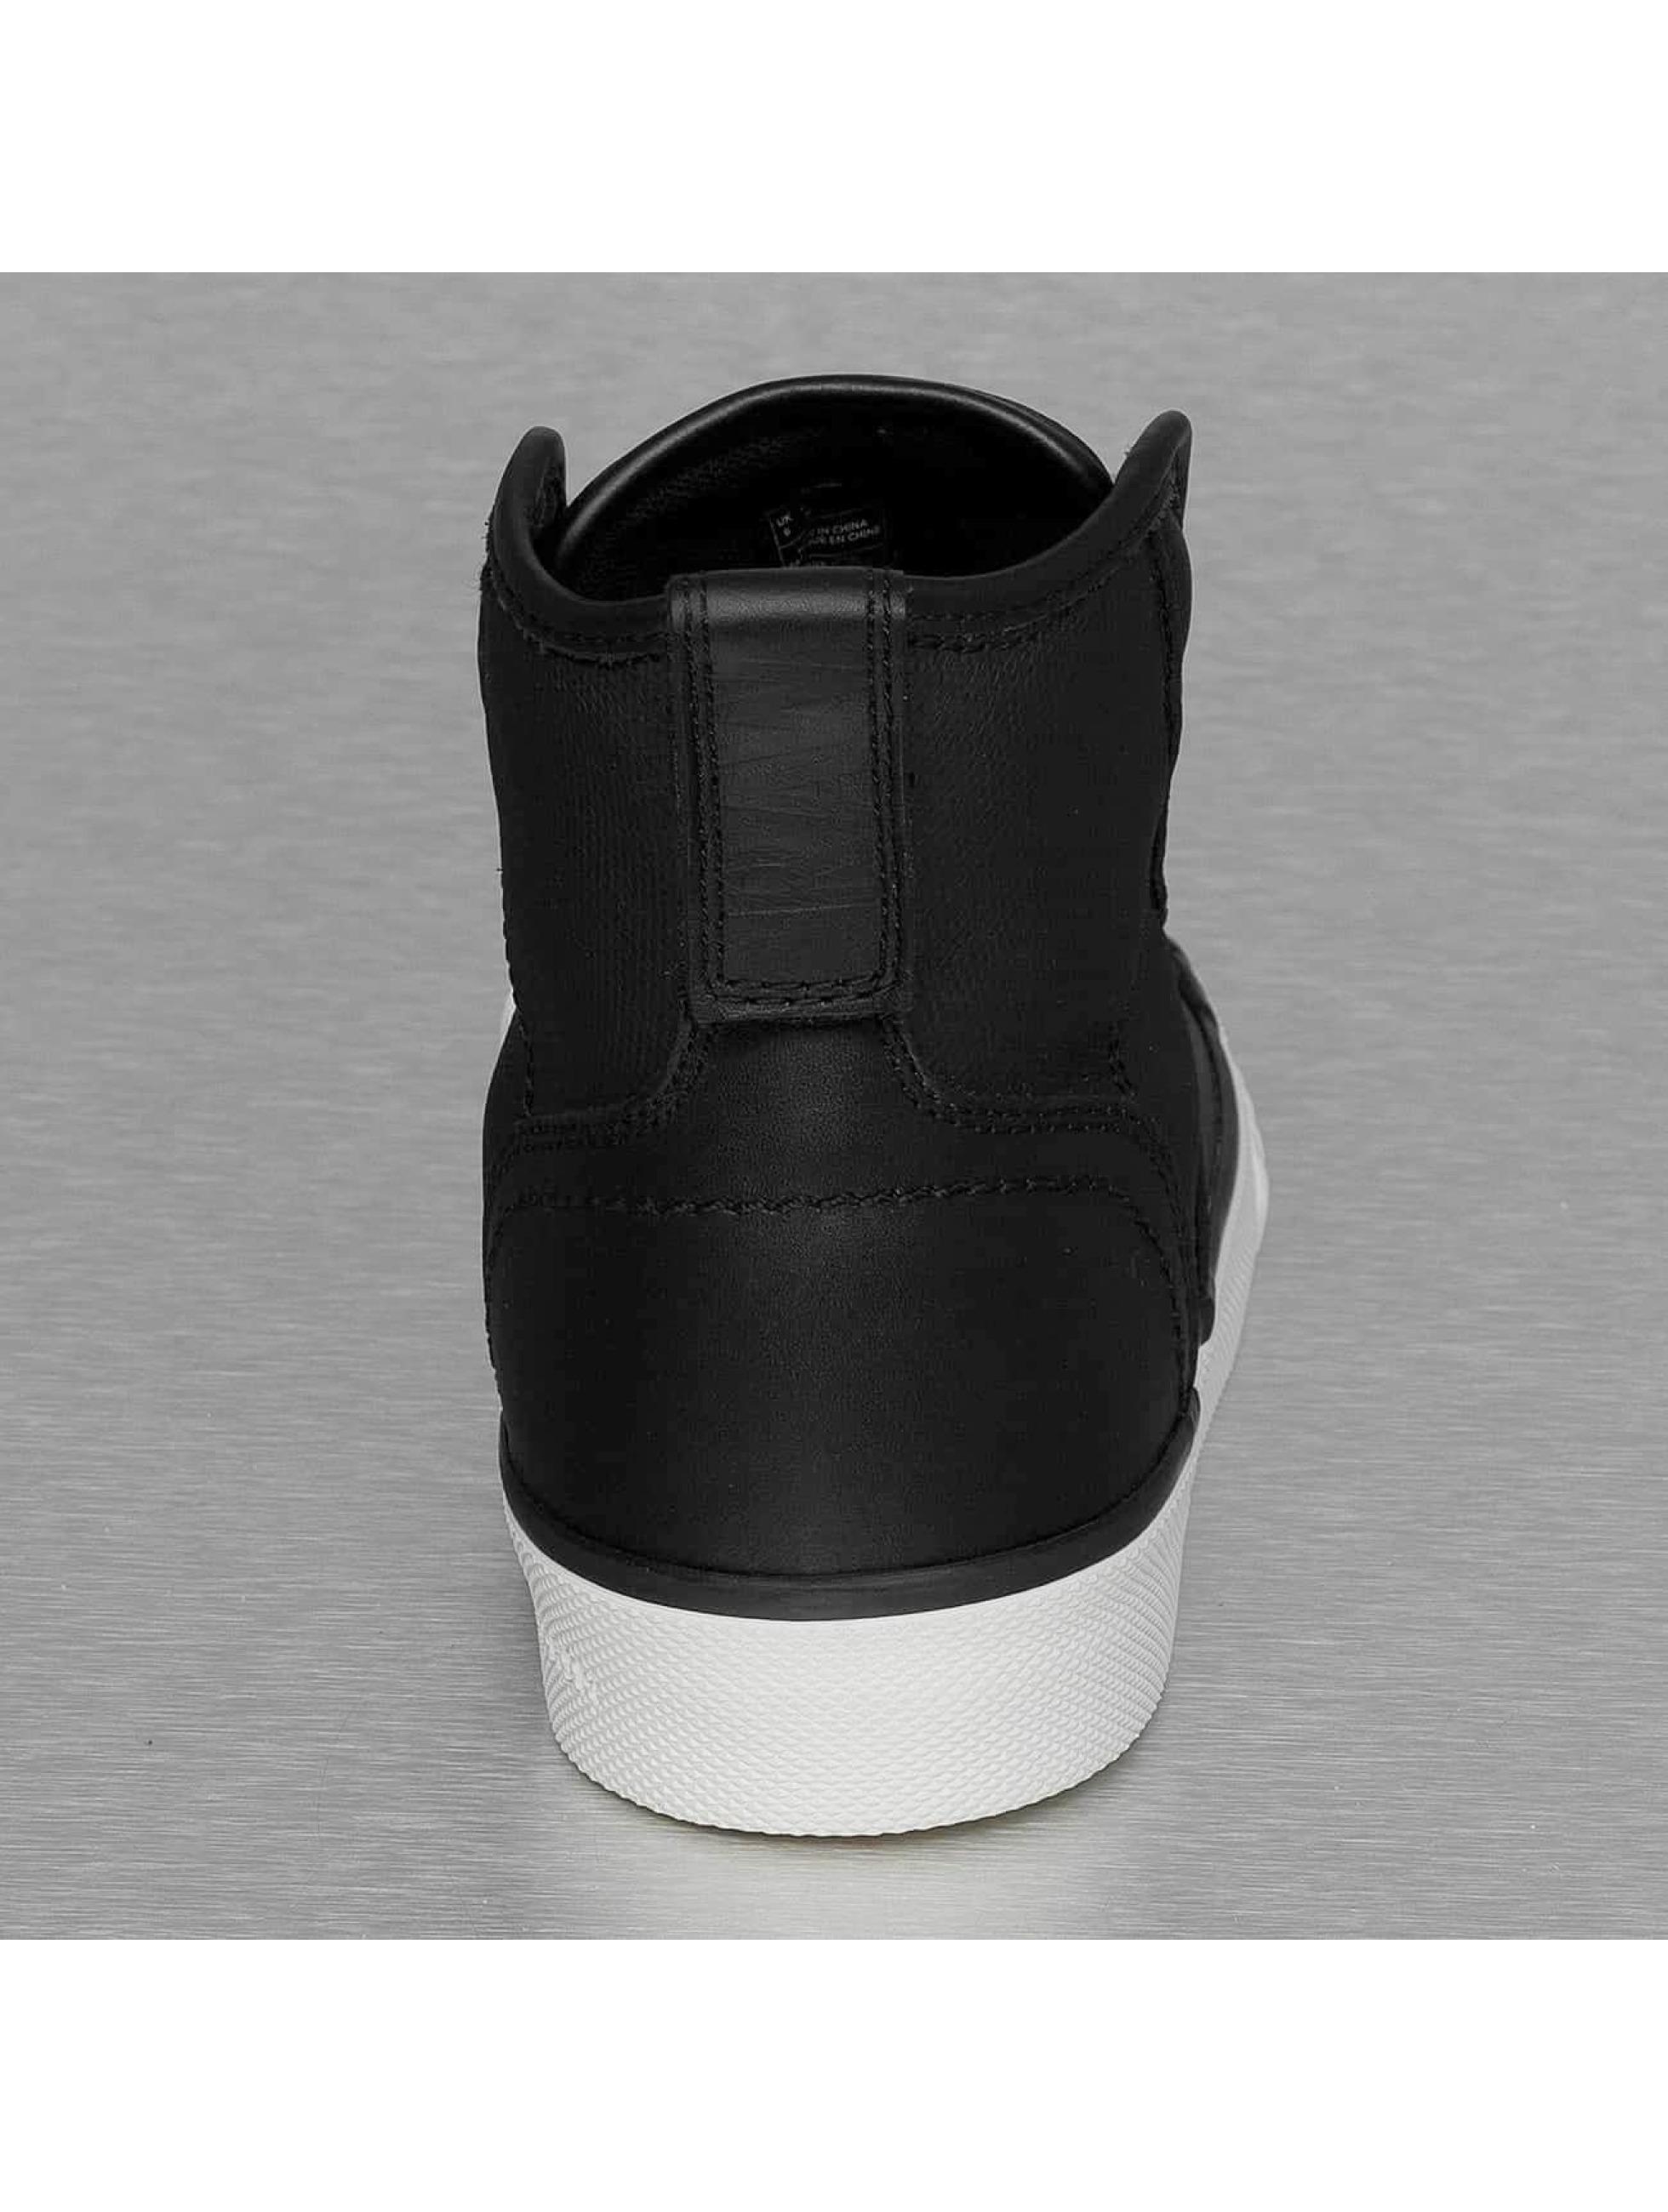 G-Star Sneaker Scuba Neoprene schwarz